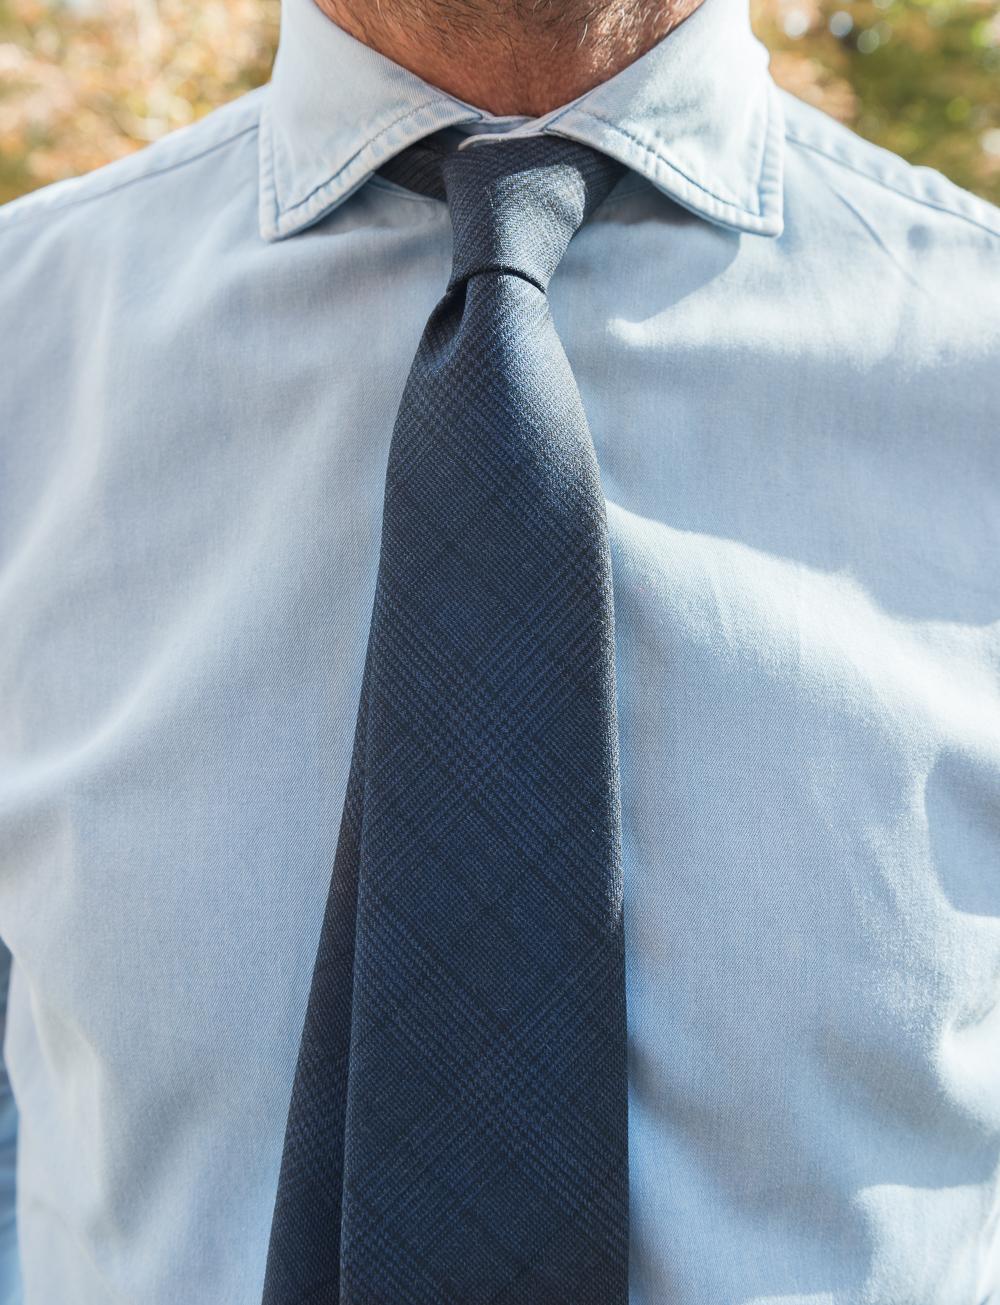 Cravate en laine motif Prince-de-Galles – bleu marine   Cadot f4d5eba449b